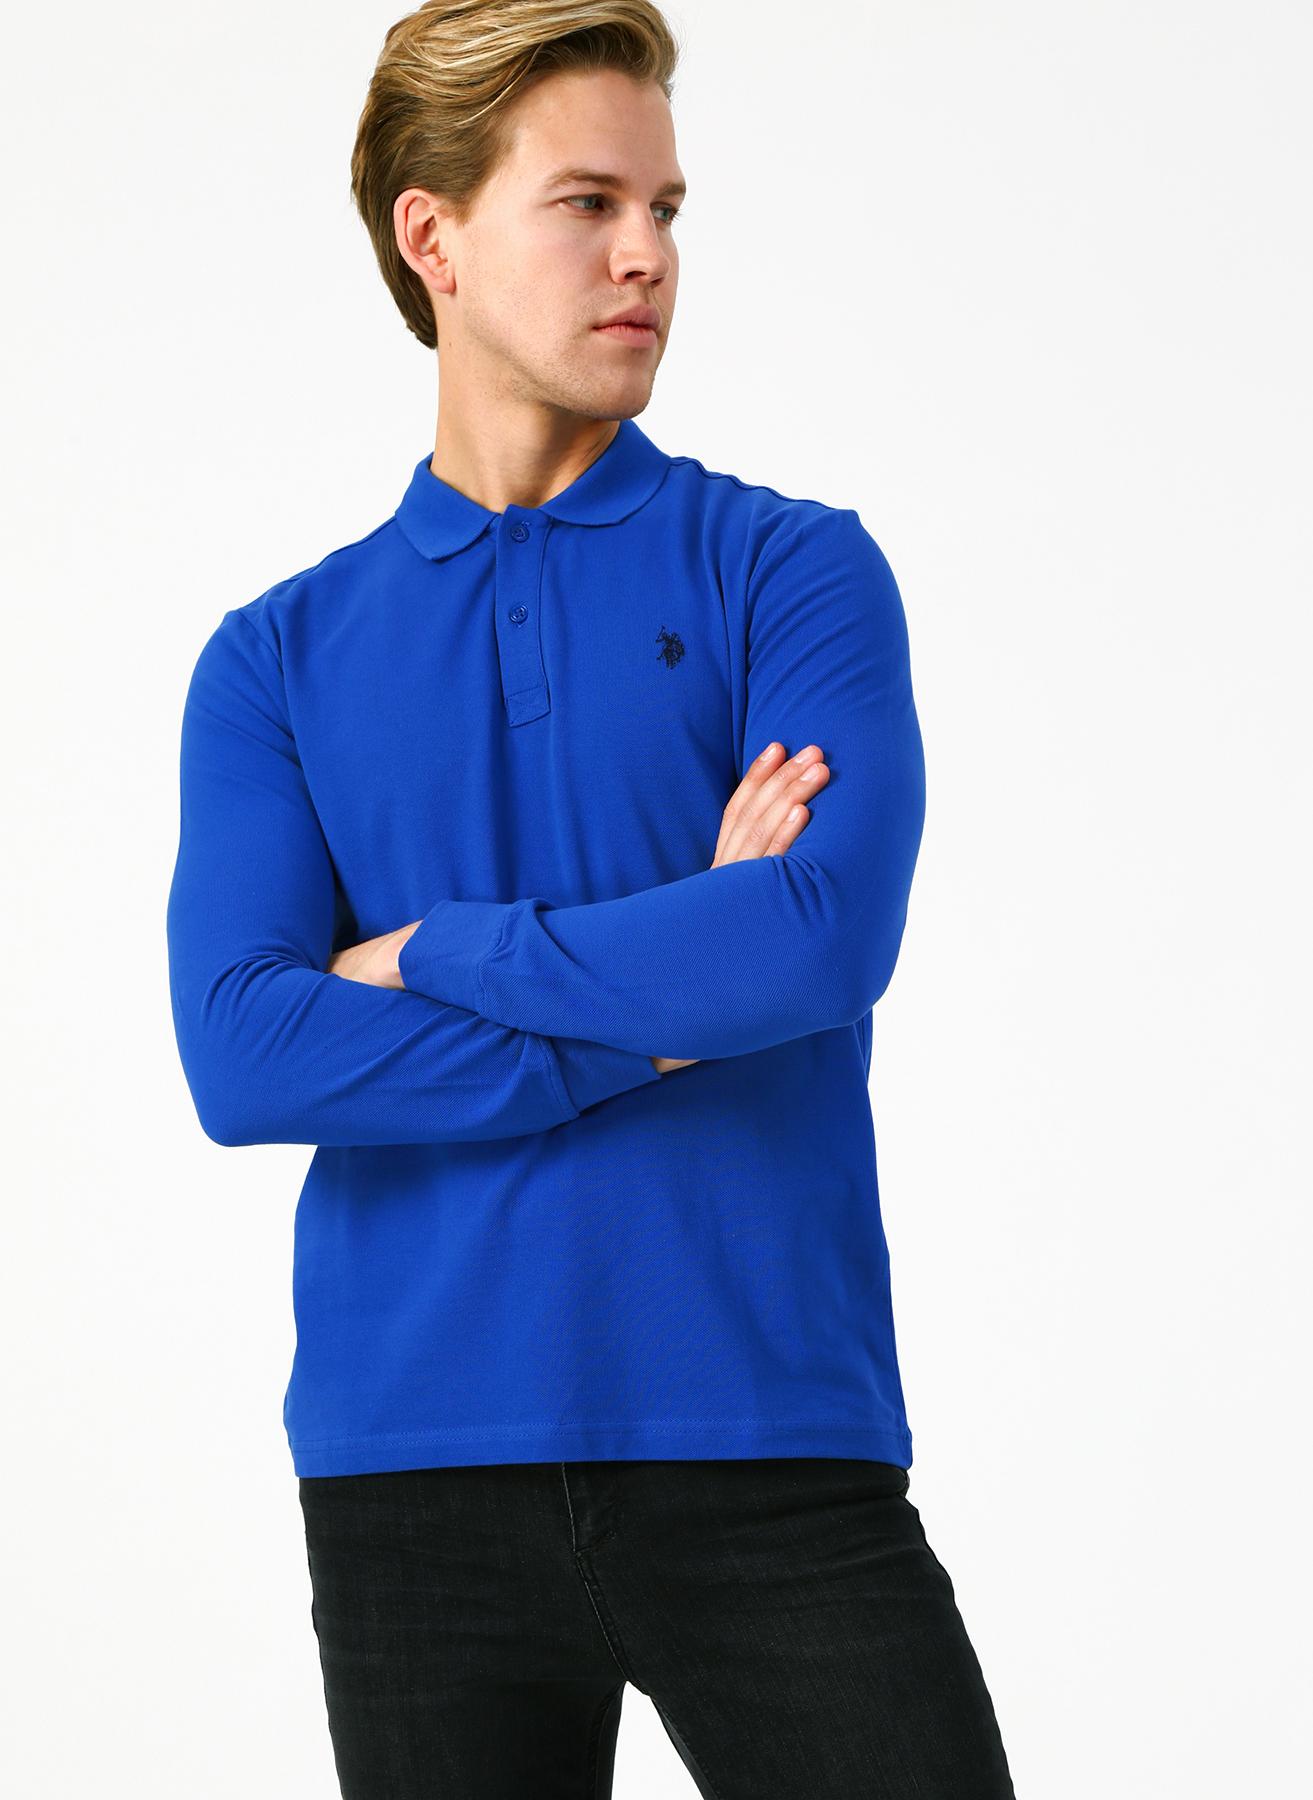 U.S. Polo Assn. Polo Yaka Lacivert Sweatshirt S 5001704369003 Ürün Resmi